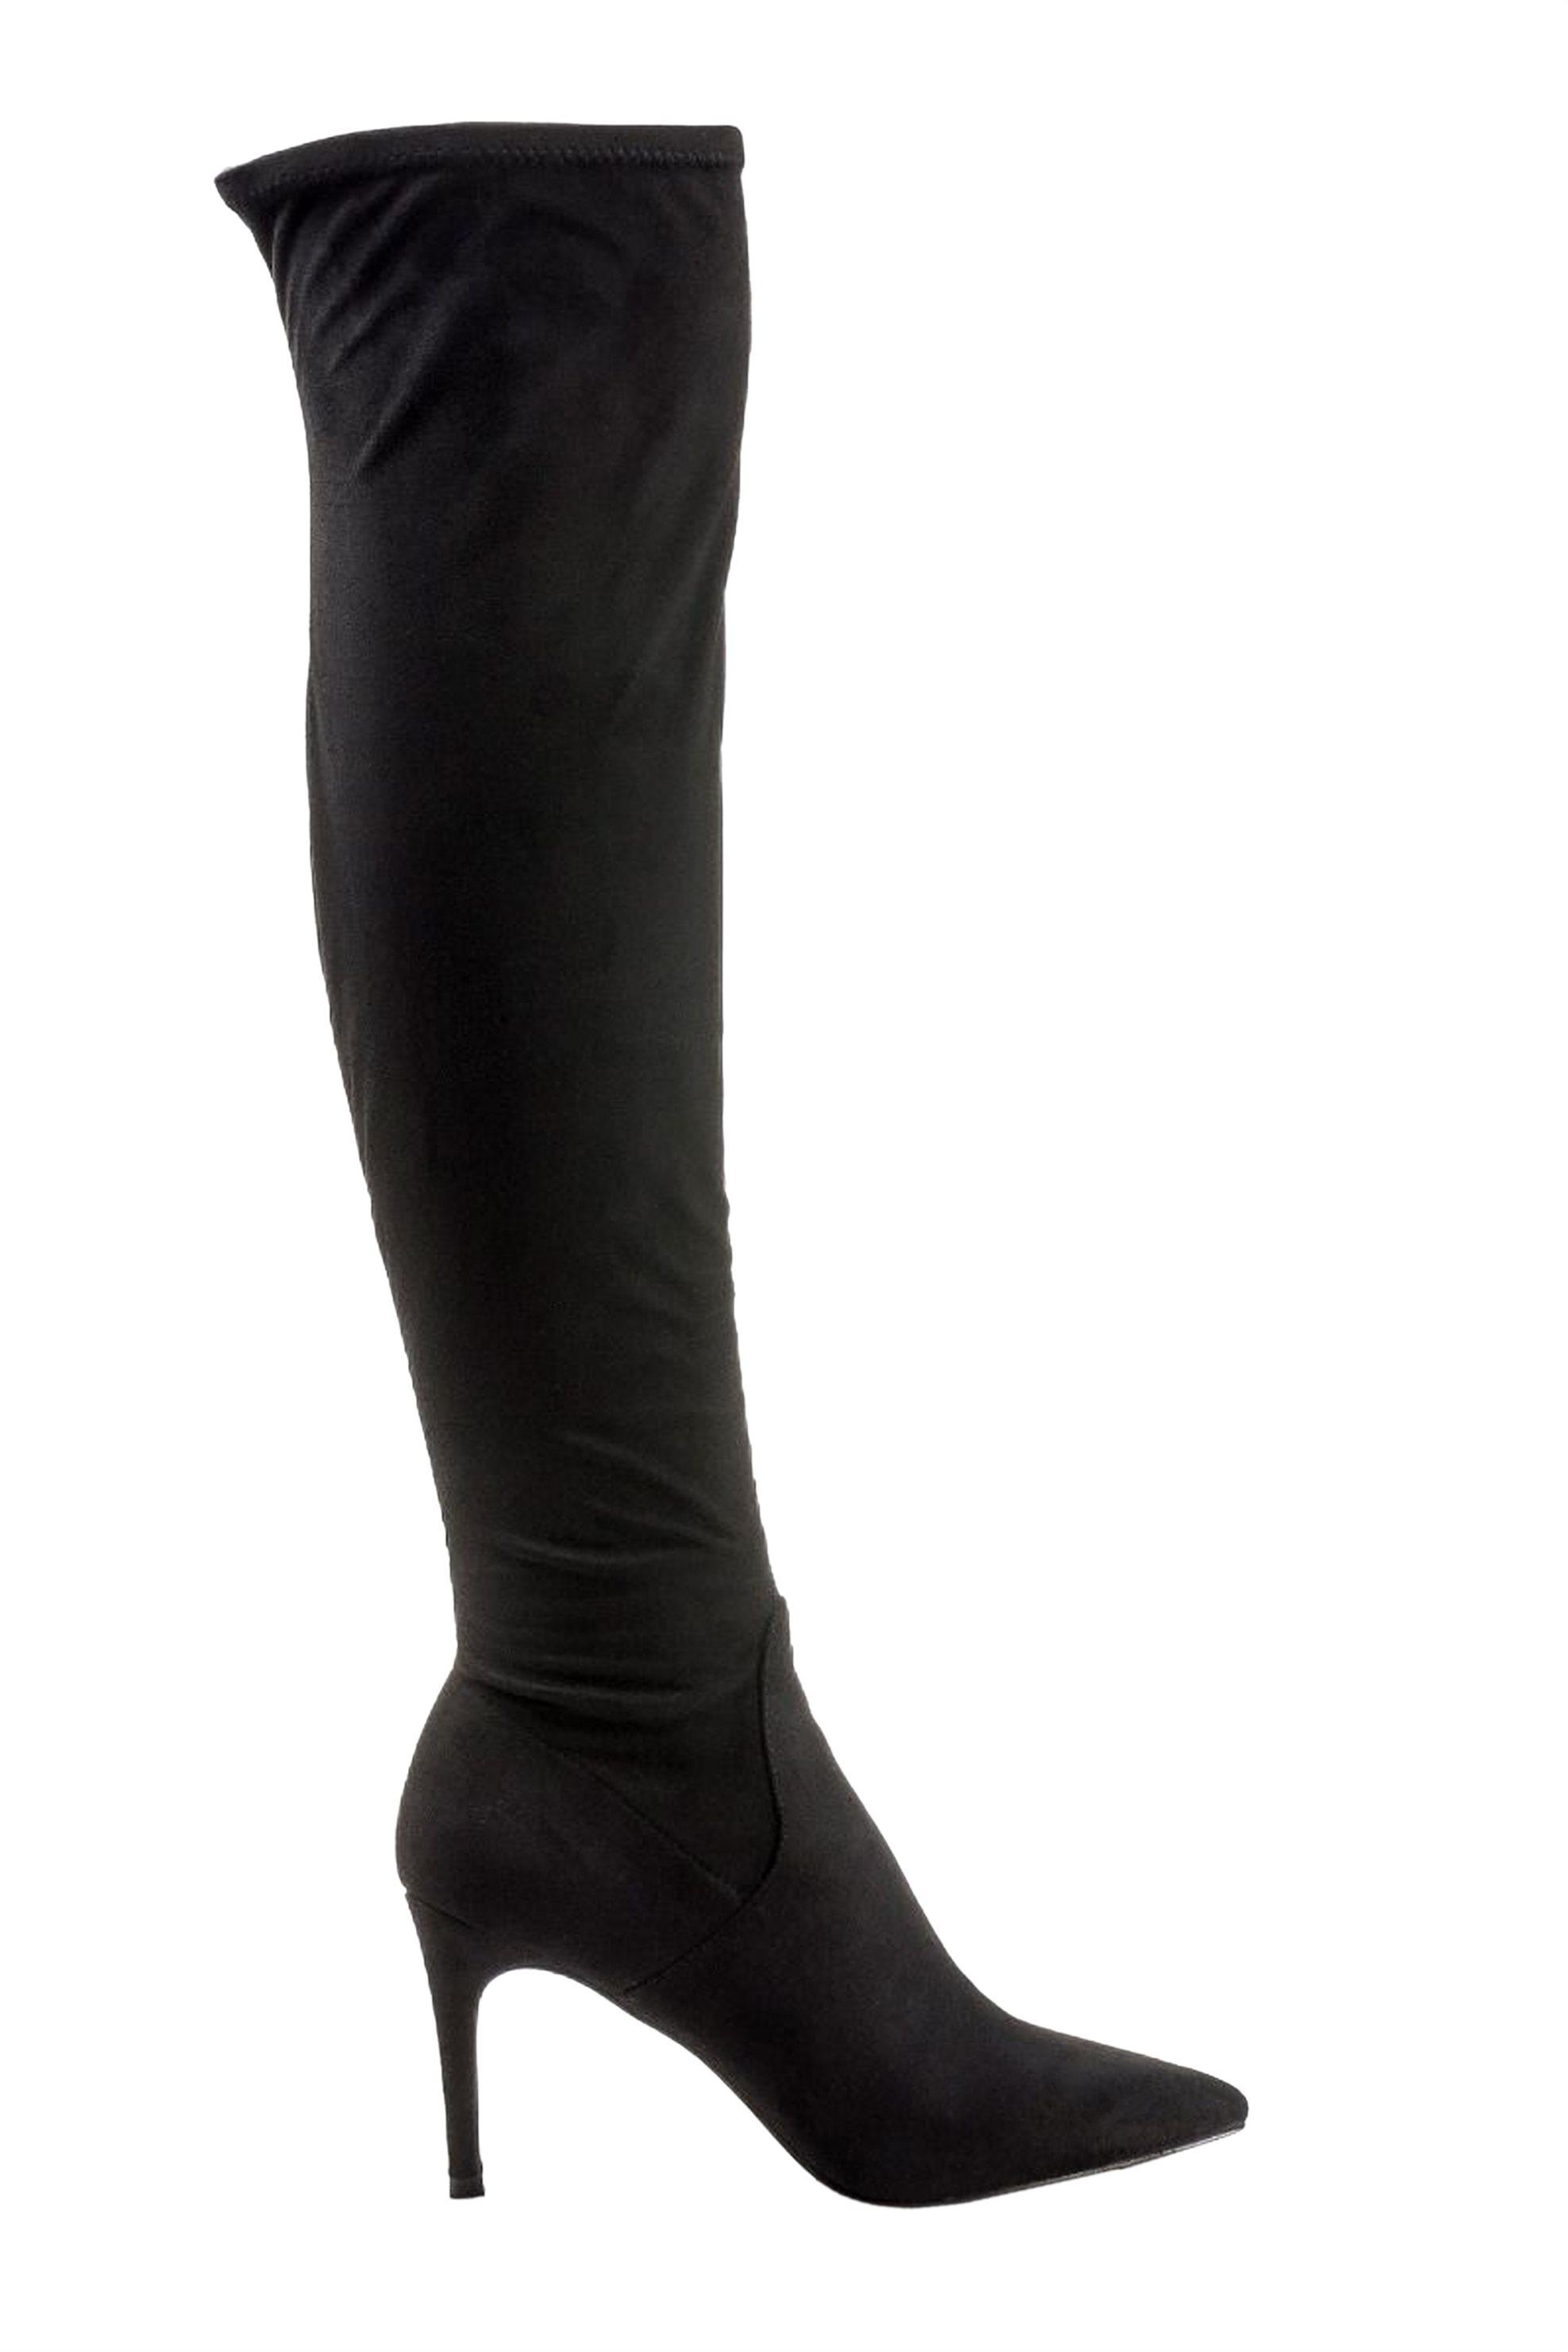 Steve Madden γυναικεία μποτά over the knee LACIE – 218744-LACIE – Μαύρο